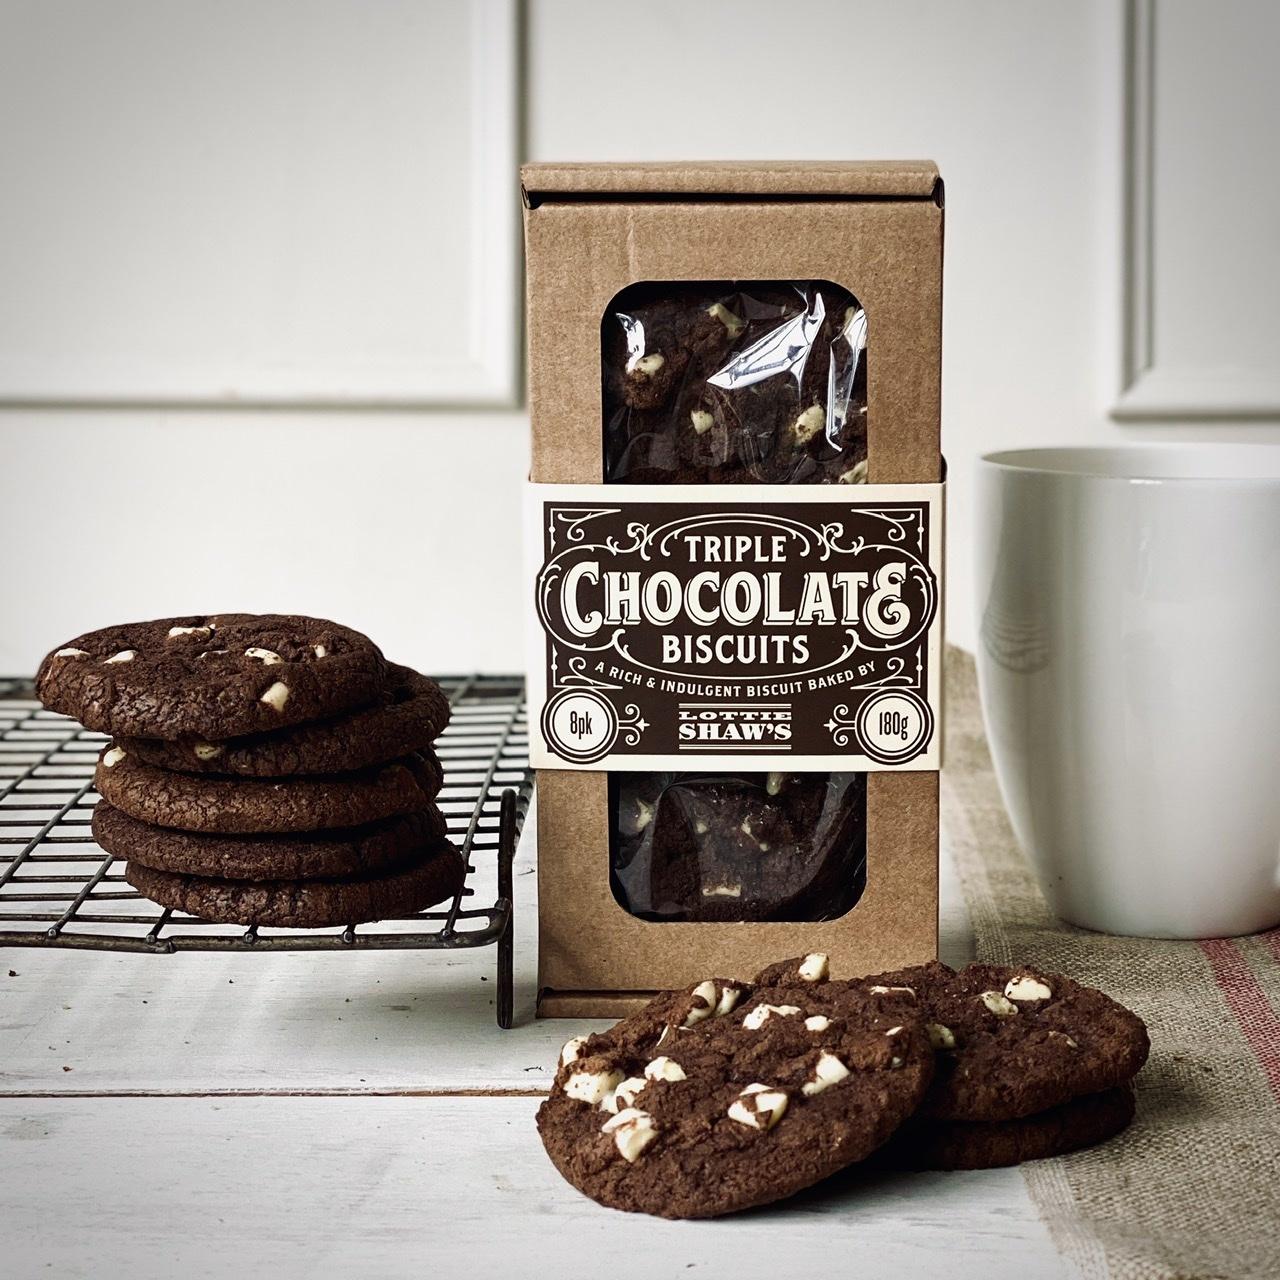 Lottie Shaw's Triple Choc Biscuit Box